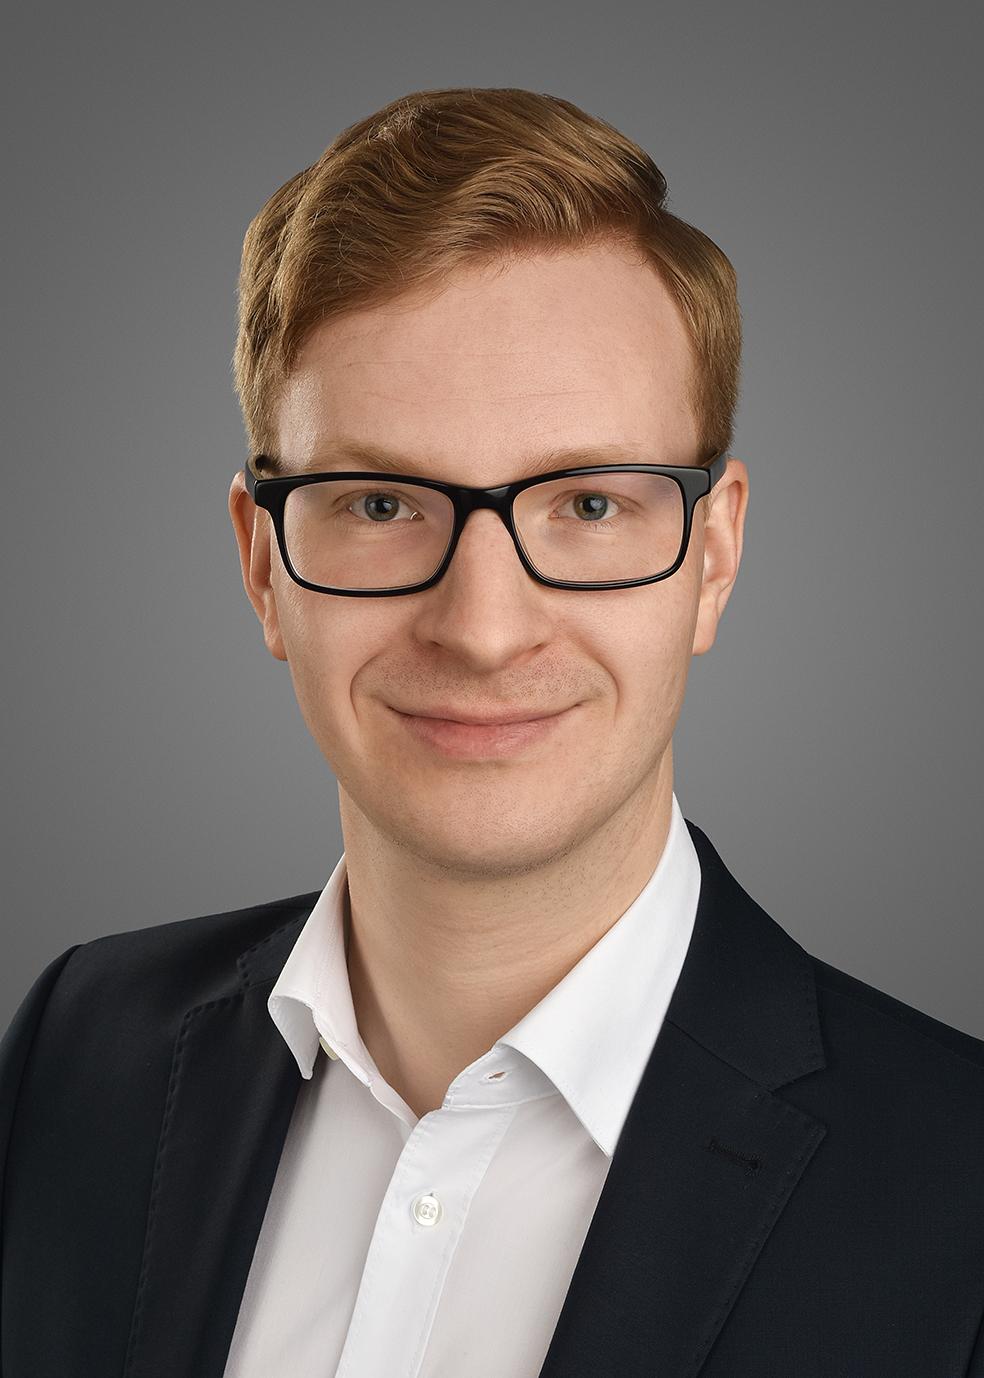 Paul Großkopf